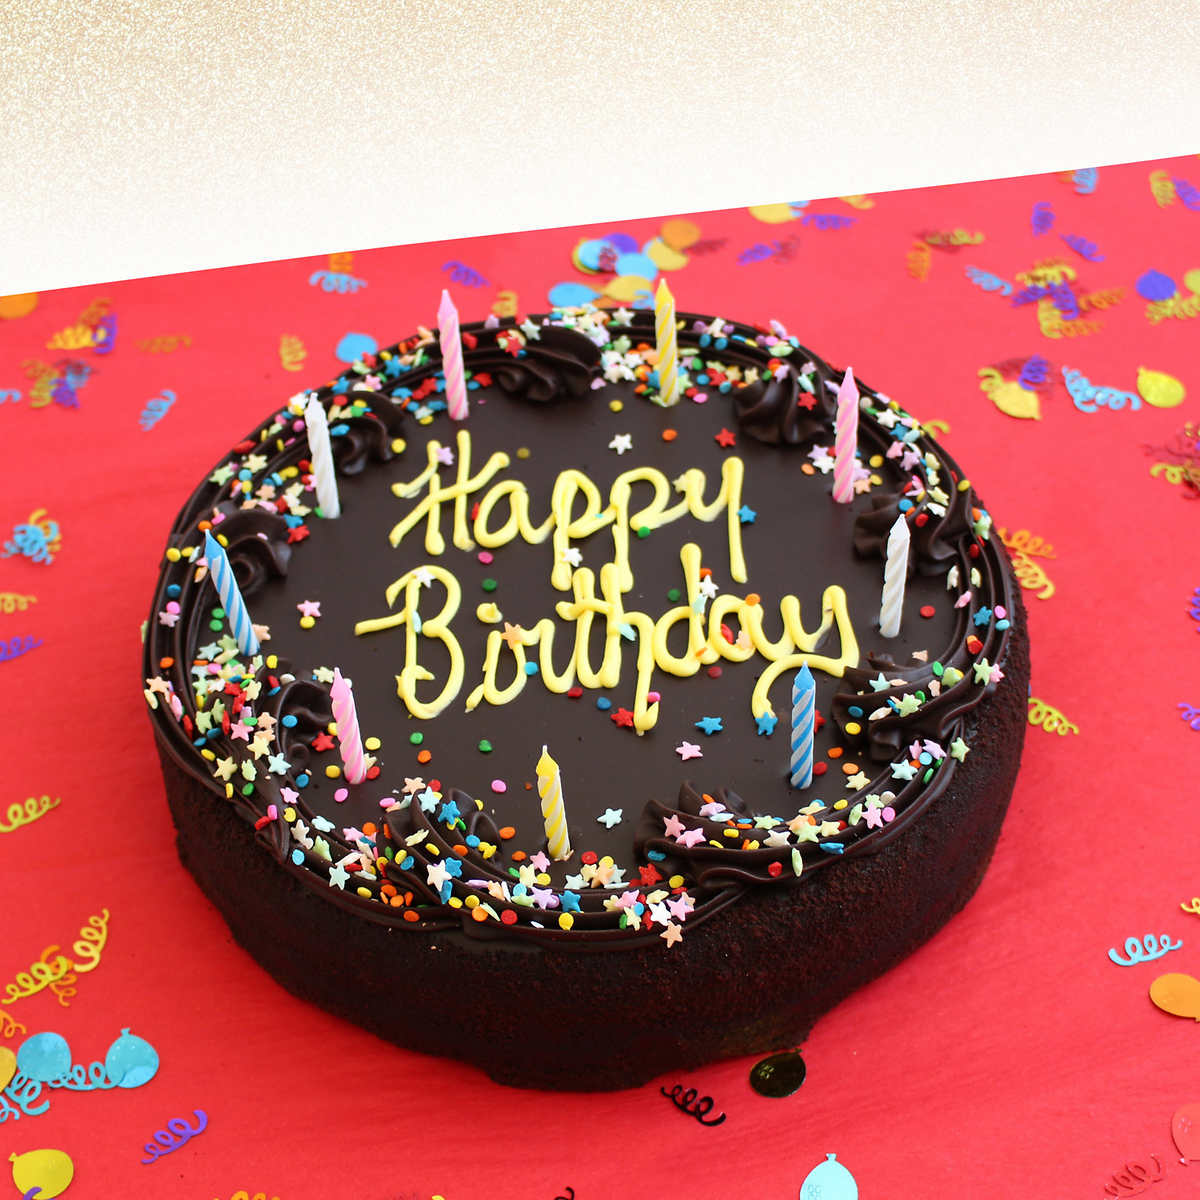 Incredible Davids Cookies Chocolate Fudge Birthday Cake 4 5 Lbs Includes Personalised Birthday Cards Fashionlily Jamesorg